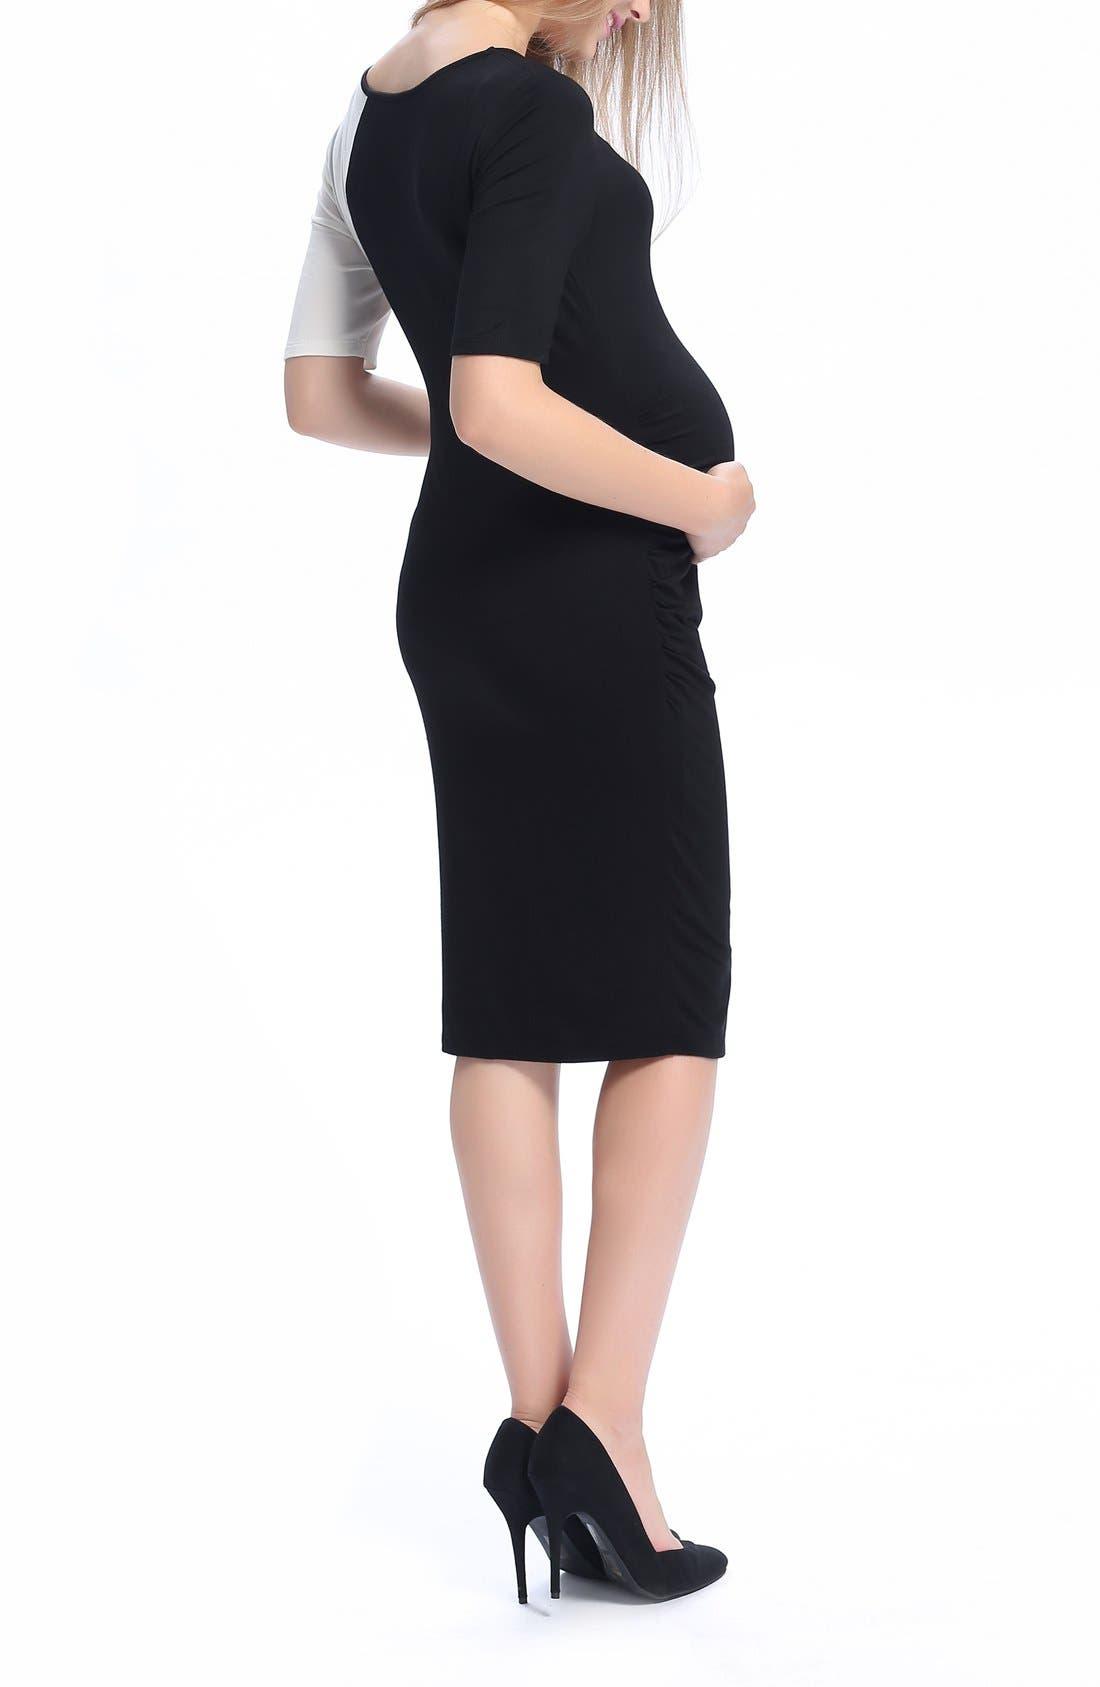 Daphne Colorblock Maternity Dress,                             Alternate thumbnail 4, color,                             Black/ White